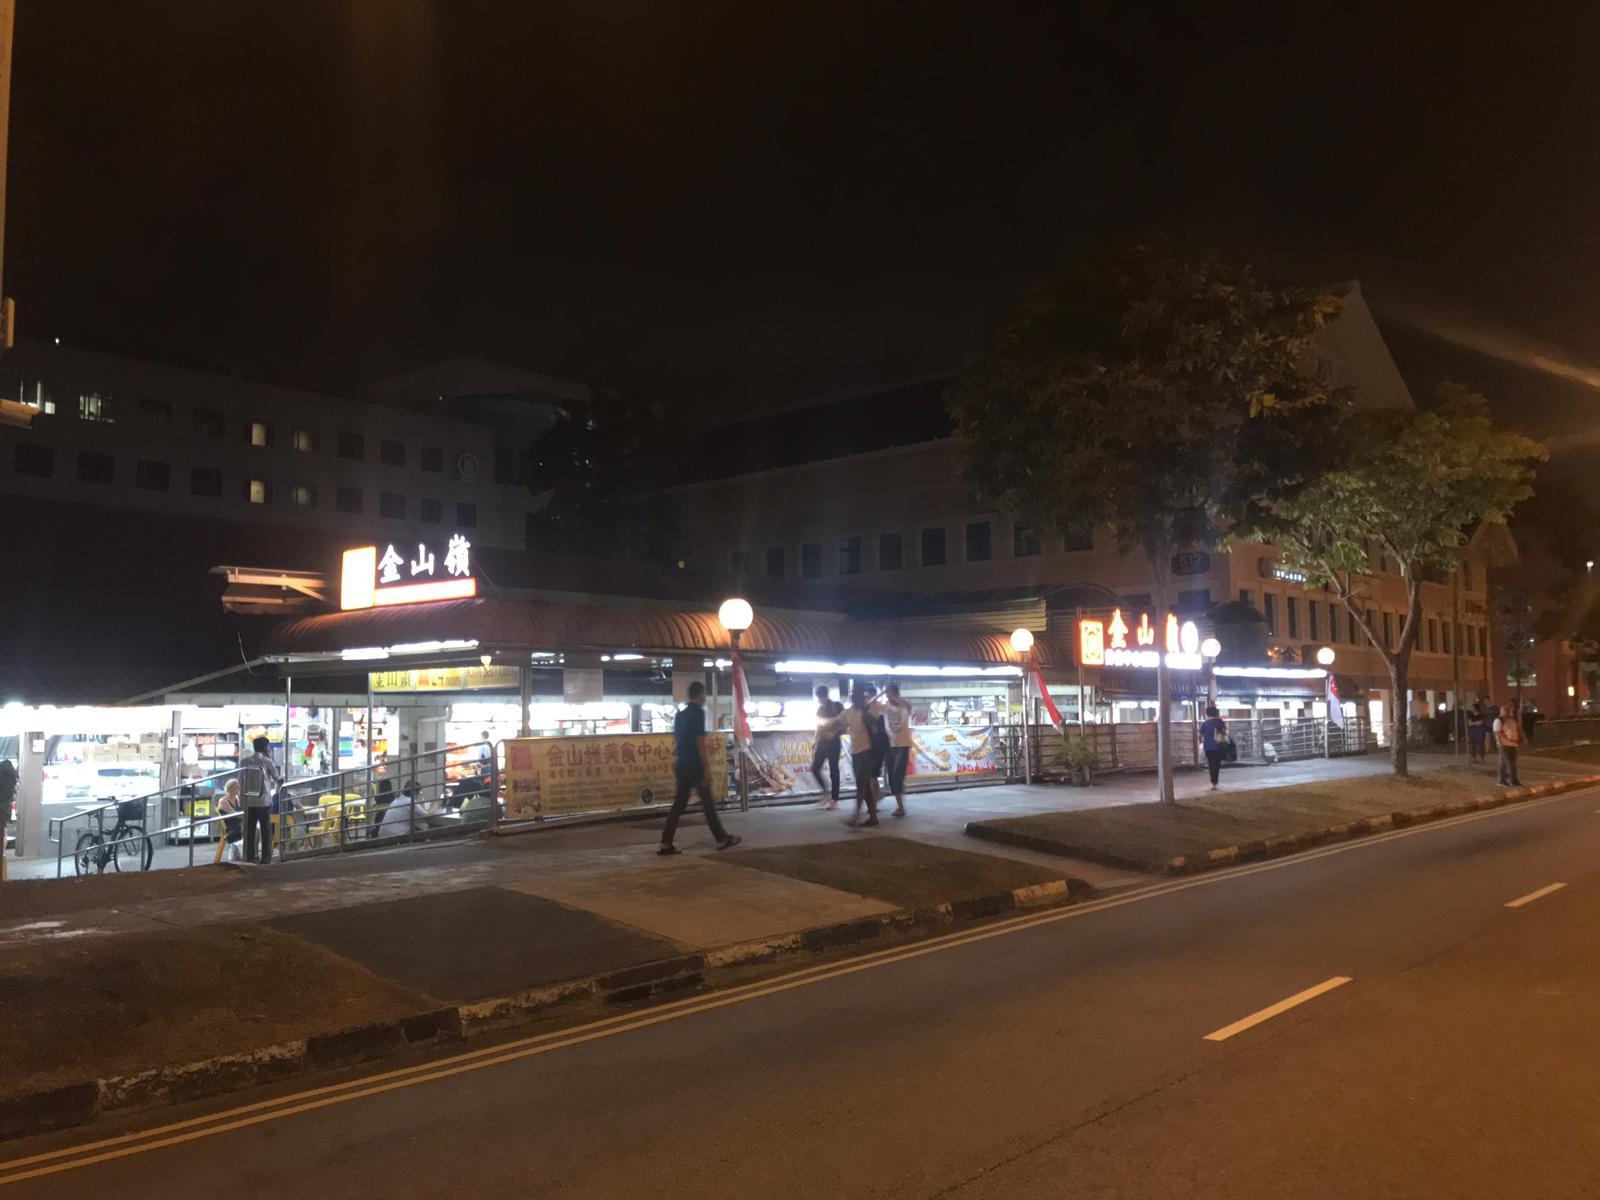 Kim San Leng Food Centre Bishan